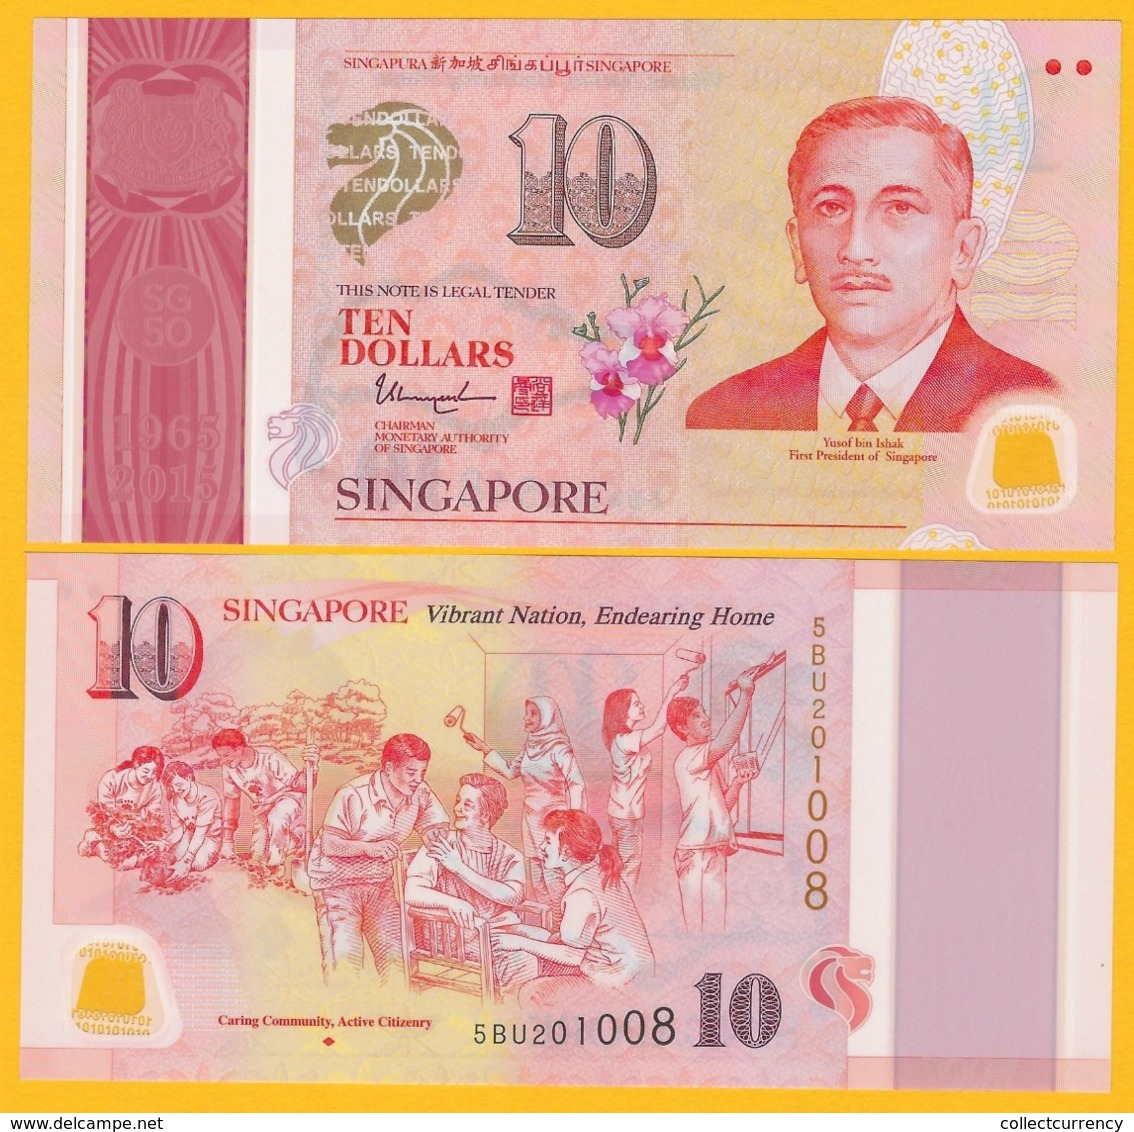 Singapore 10 Dollars P-60 2015 Commemorative UNC Polymer Banknote - Singapore